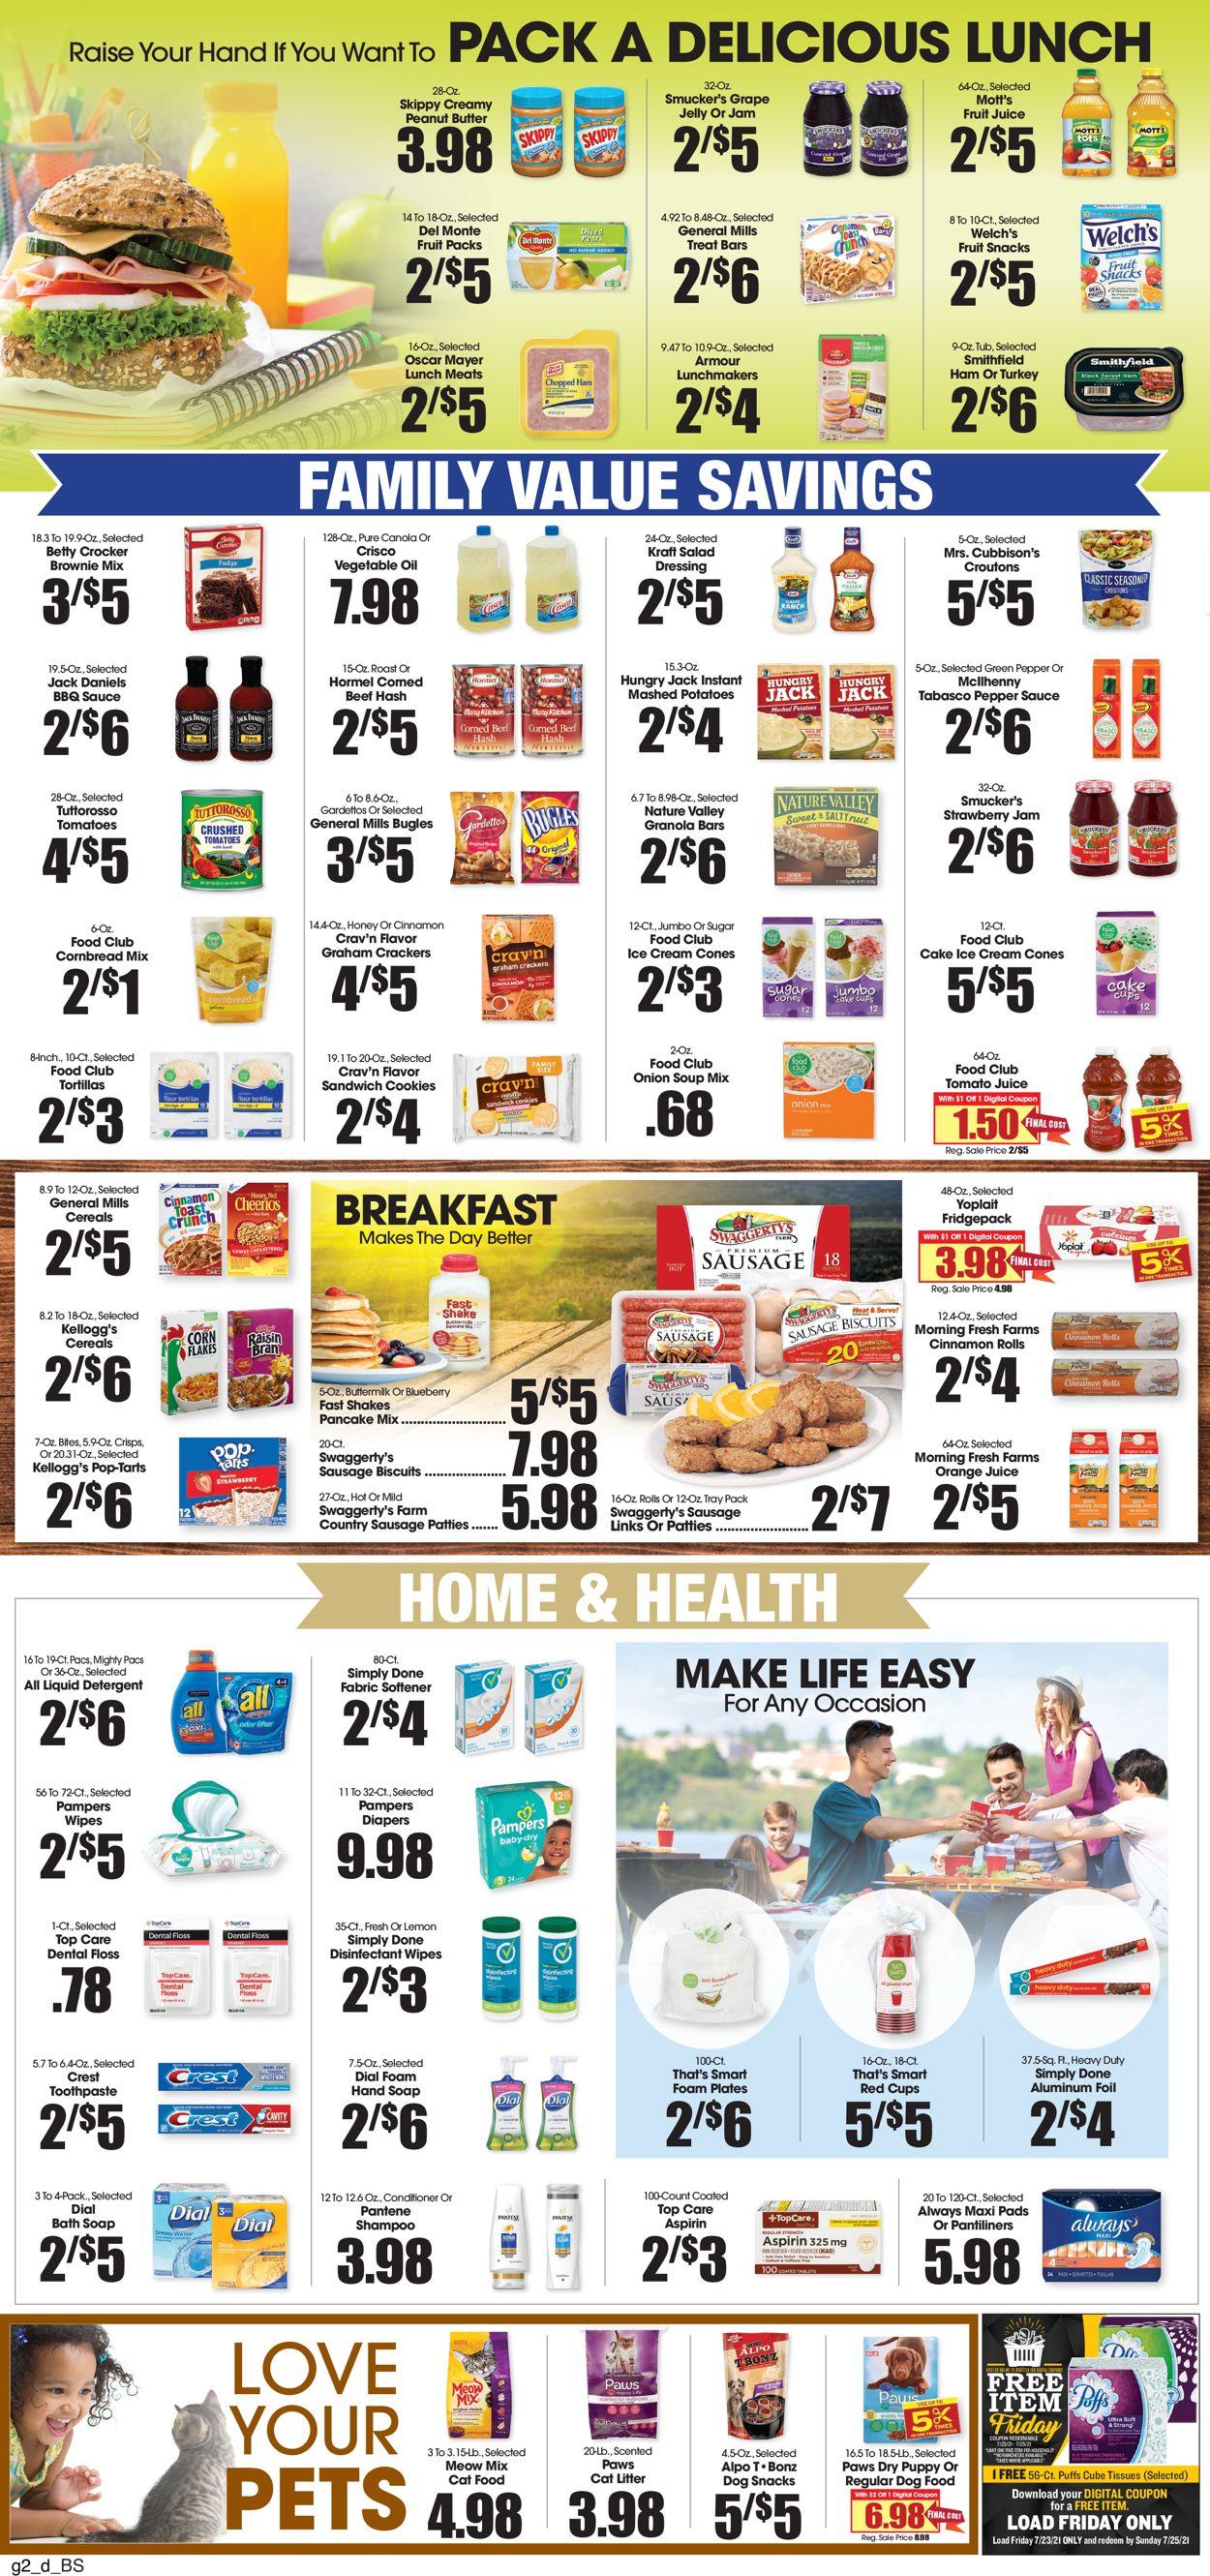 Food King Weekly Ad Circular - valid 07/21-07/27/2021 (Page 2)